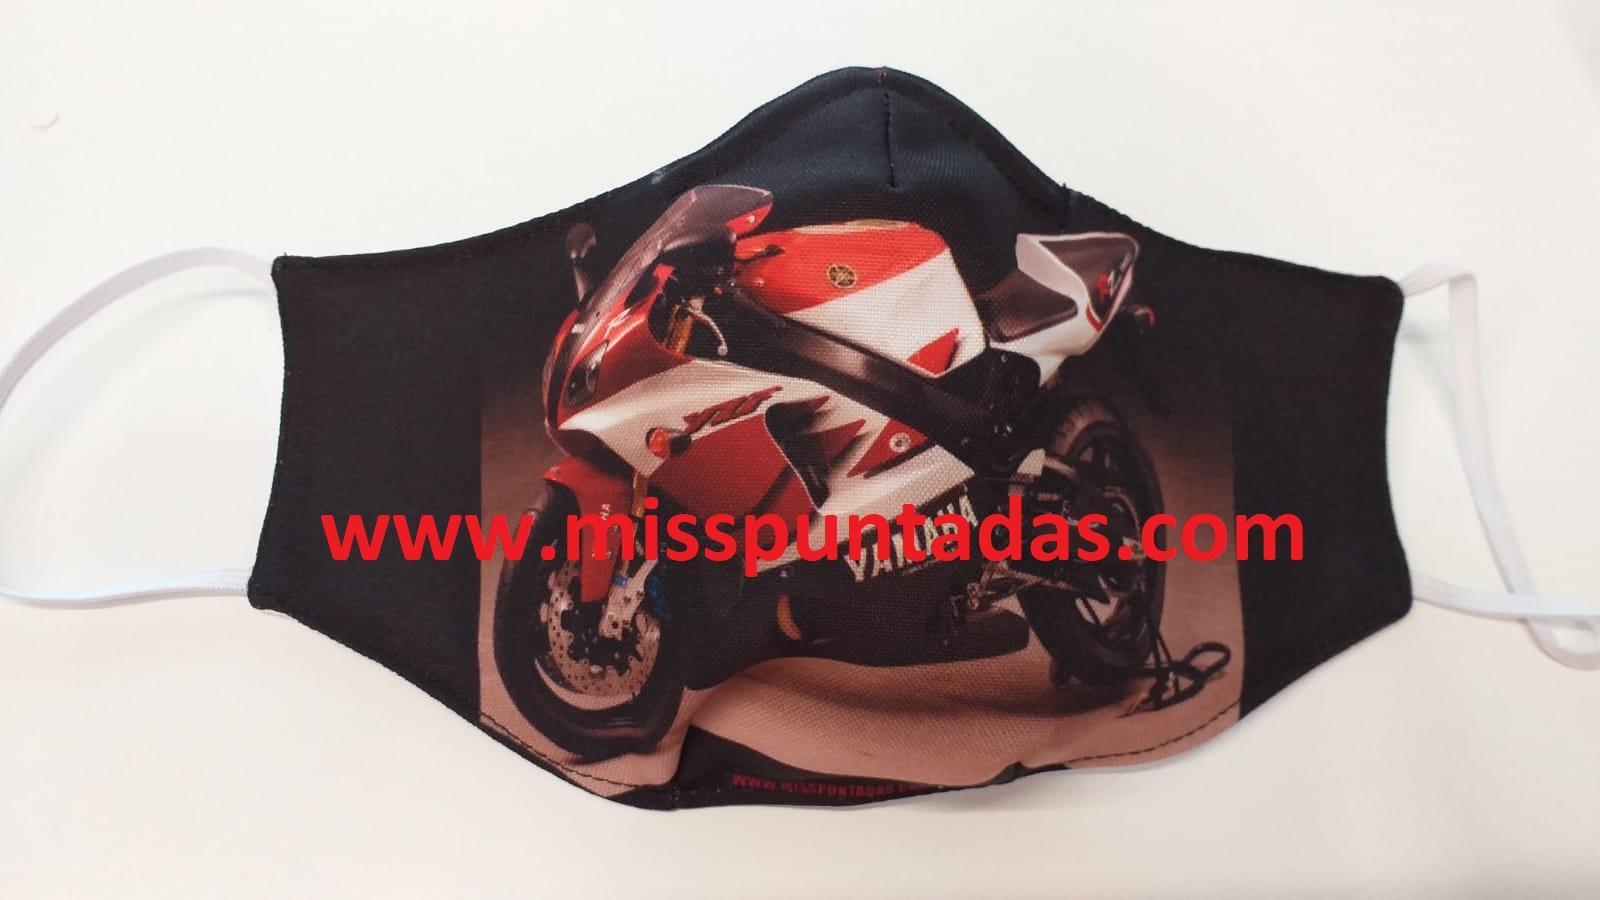 Mascarilla Moto Yamaha hacia la izquierda MP-VR